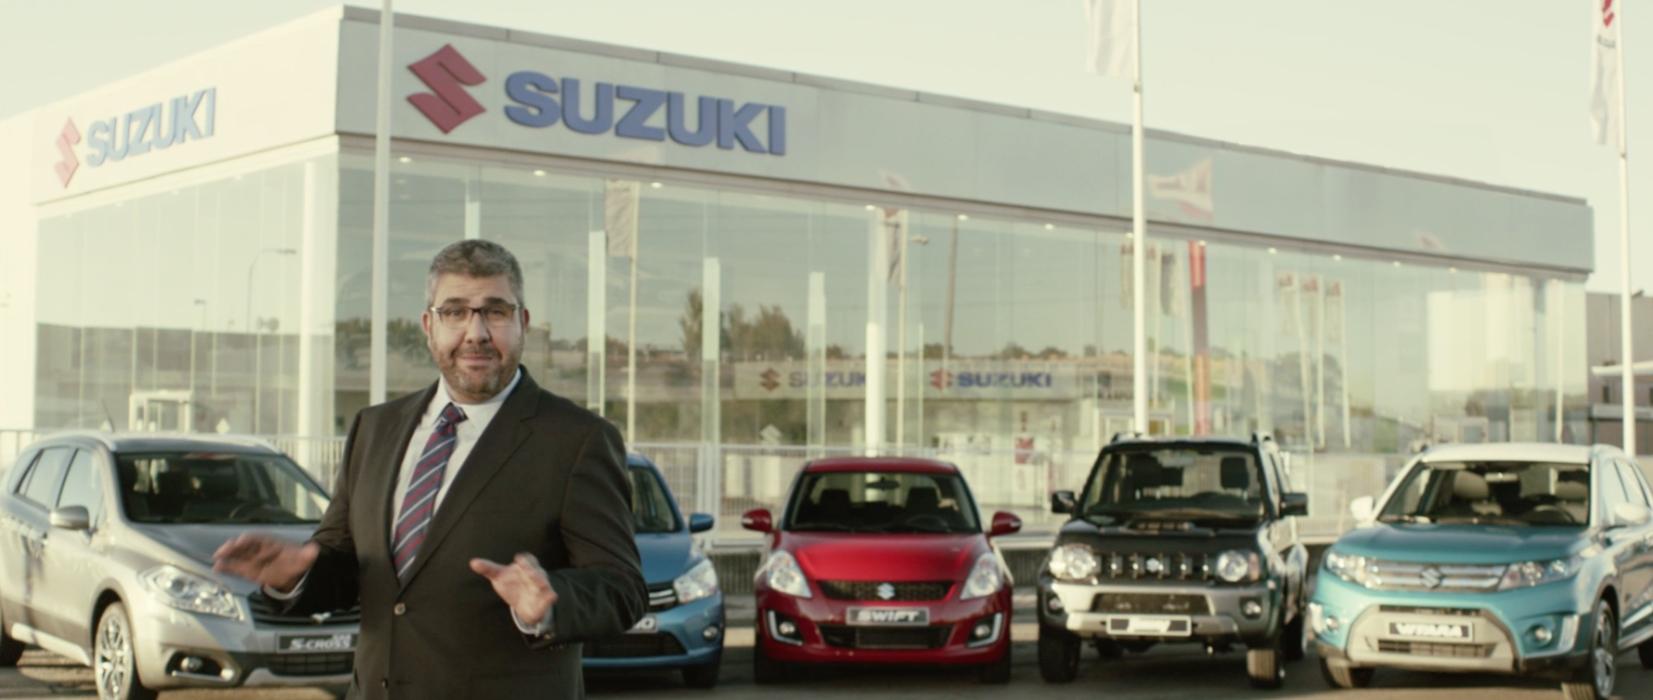 Suzuki ficha a Florentino Fernández como vendedor de coches